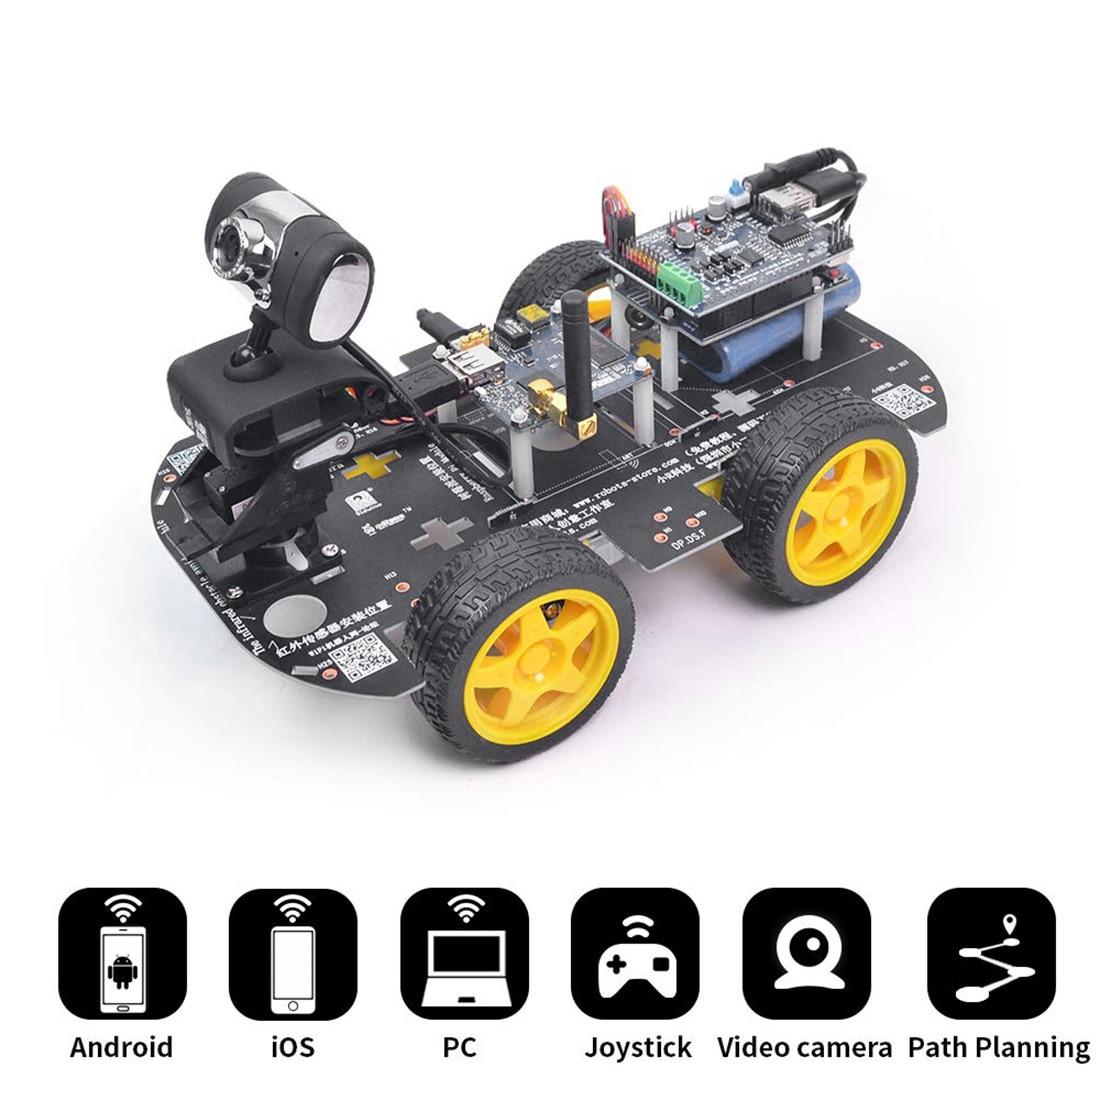 1set DIY Programmable Robot Car Wifi Steam Educational Car For Raspberry Pi 4 (2G) - Standard Edition US Plug